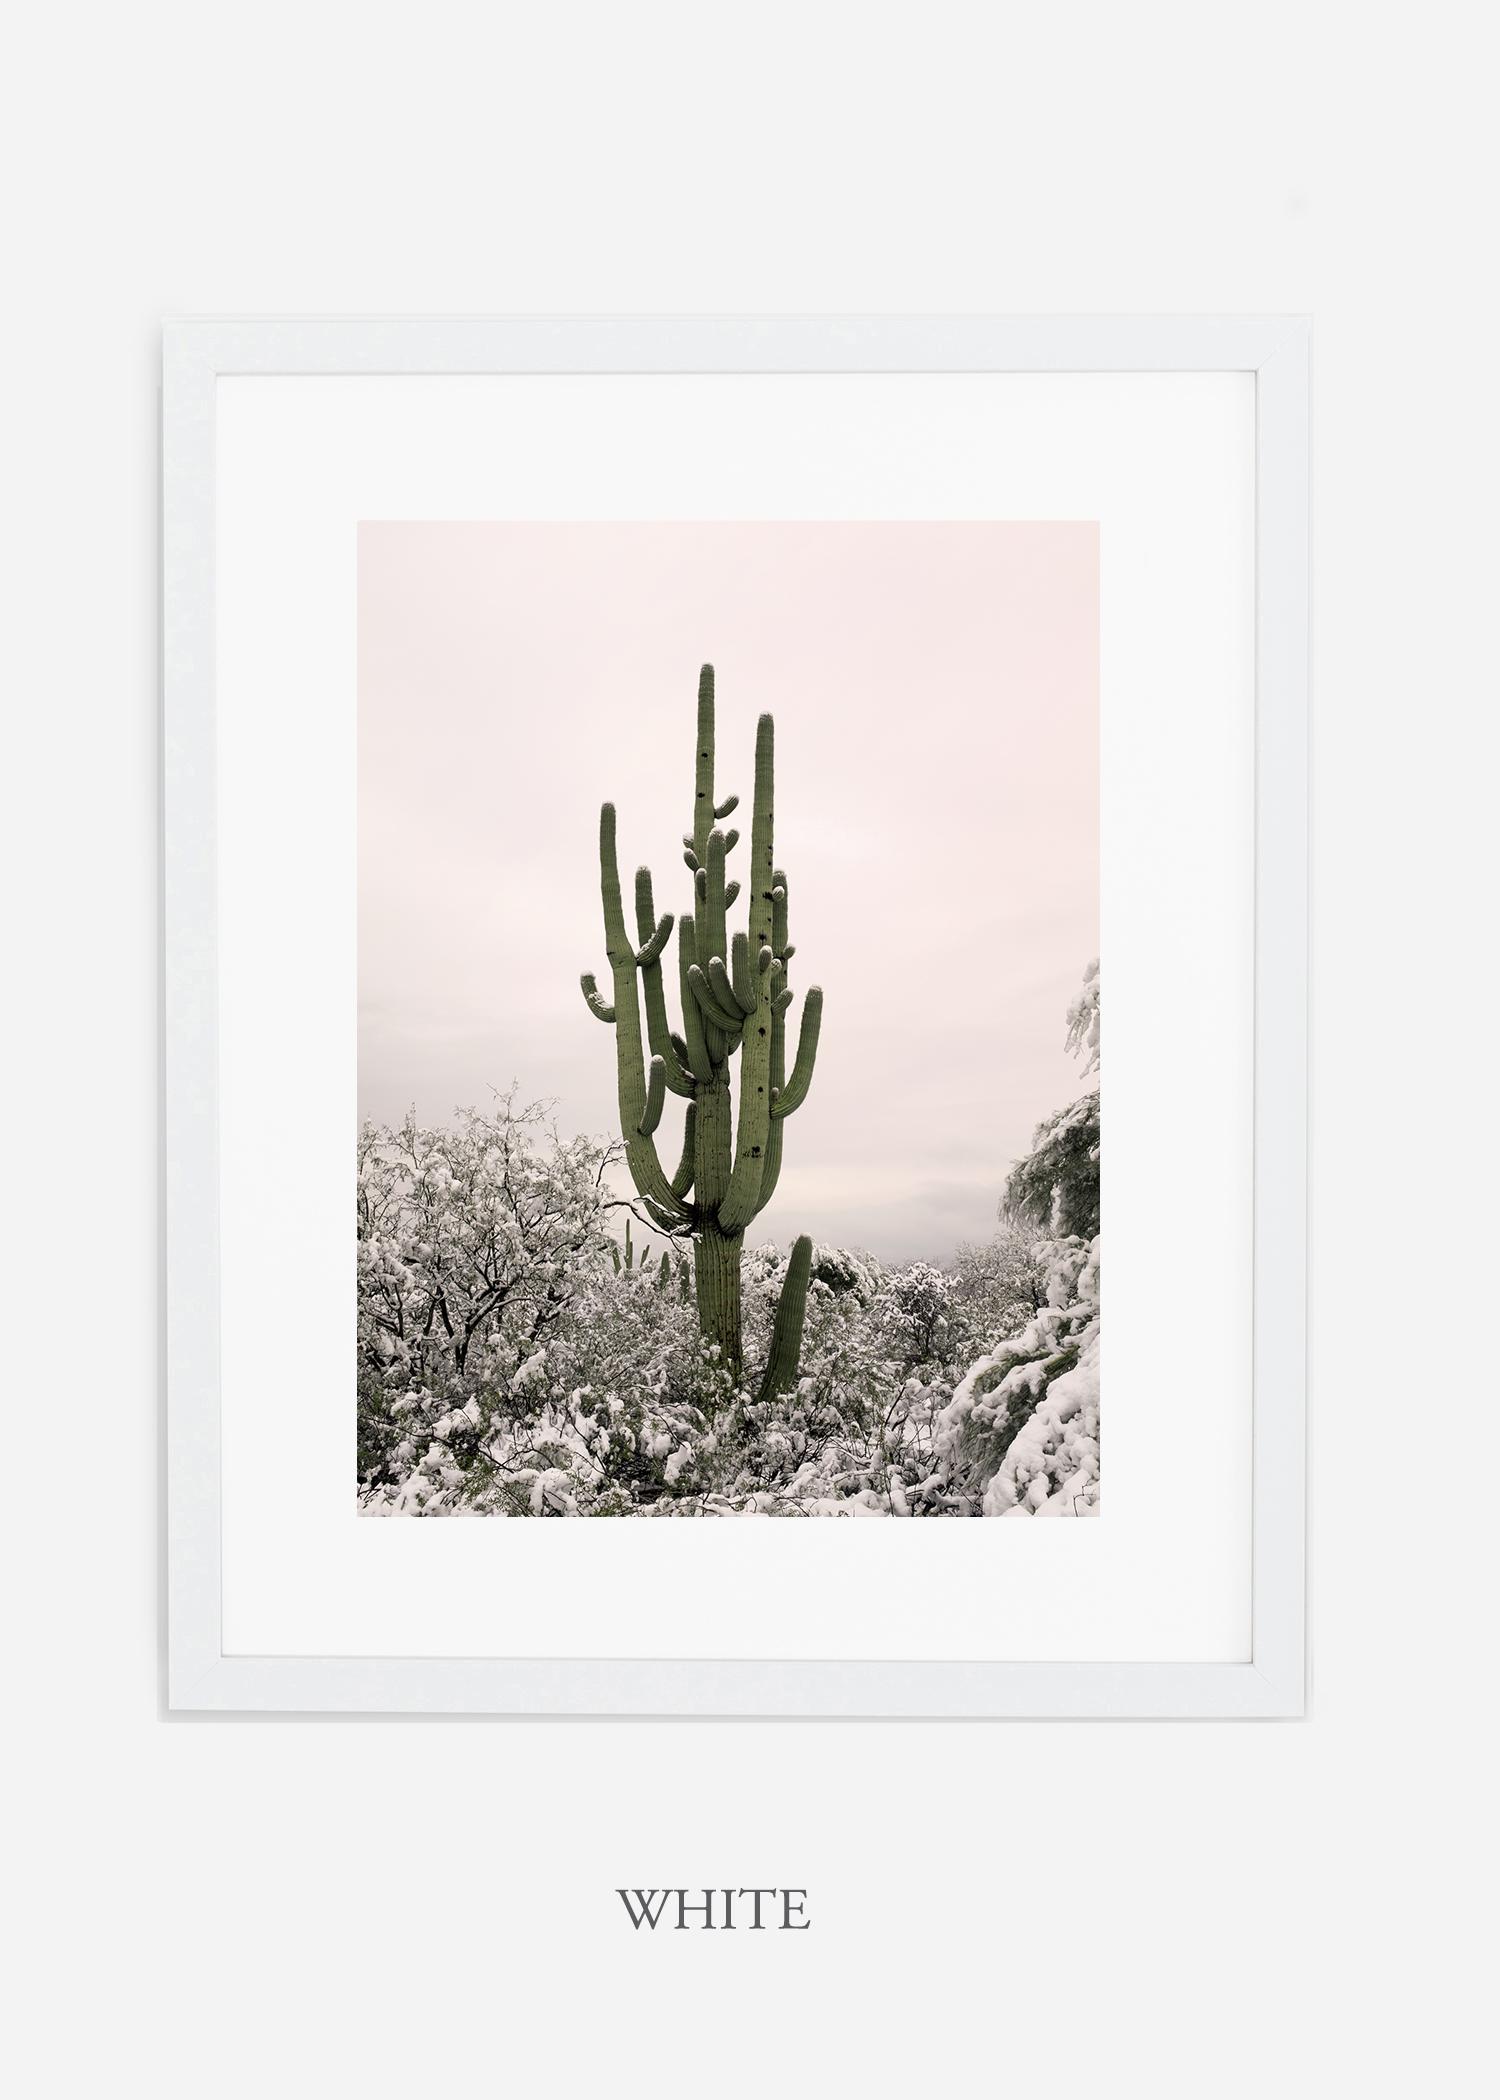 whiteframe-saguaroNo.8-wildercalifornia-art-wallart-cactusprint-homedecor-prints-arizona-botanical-artwork-interiordesign.jpg